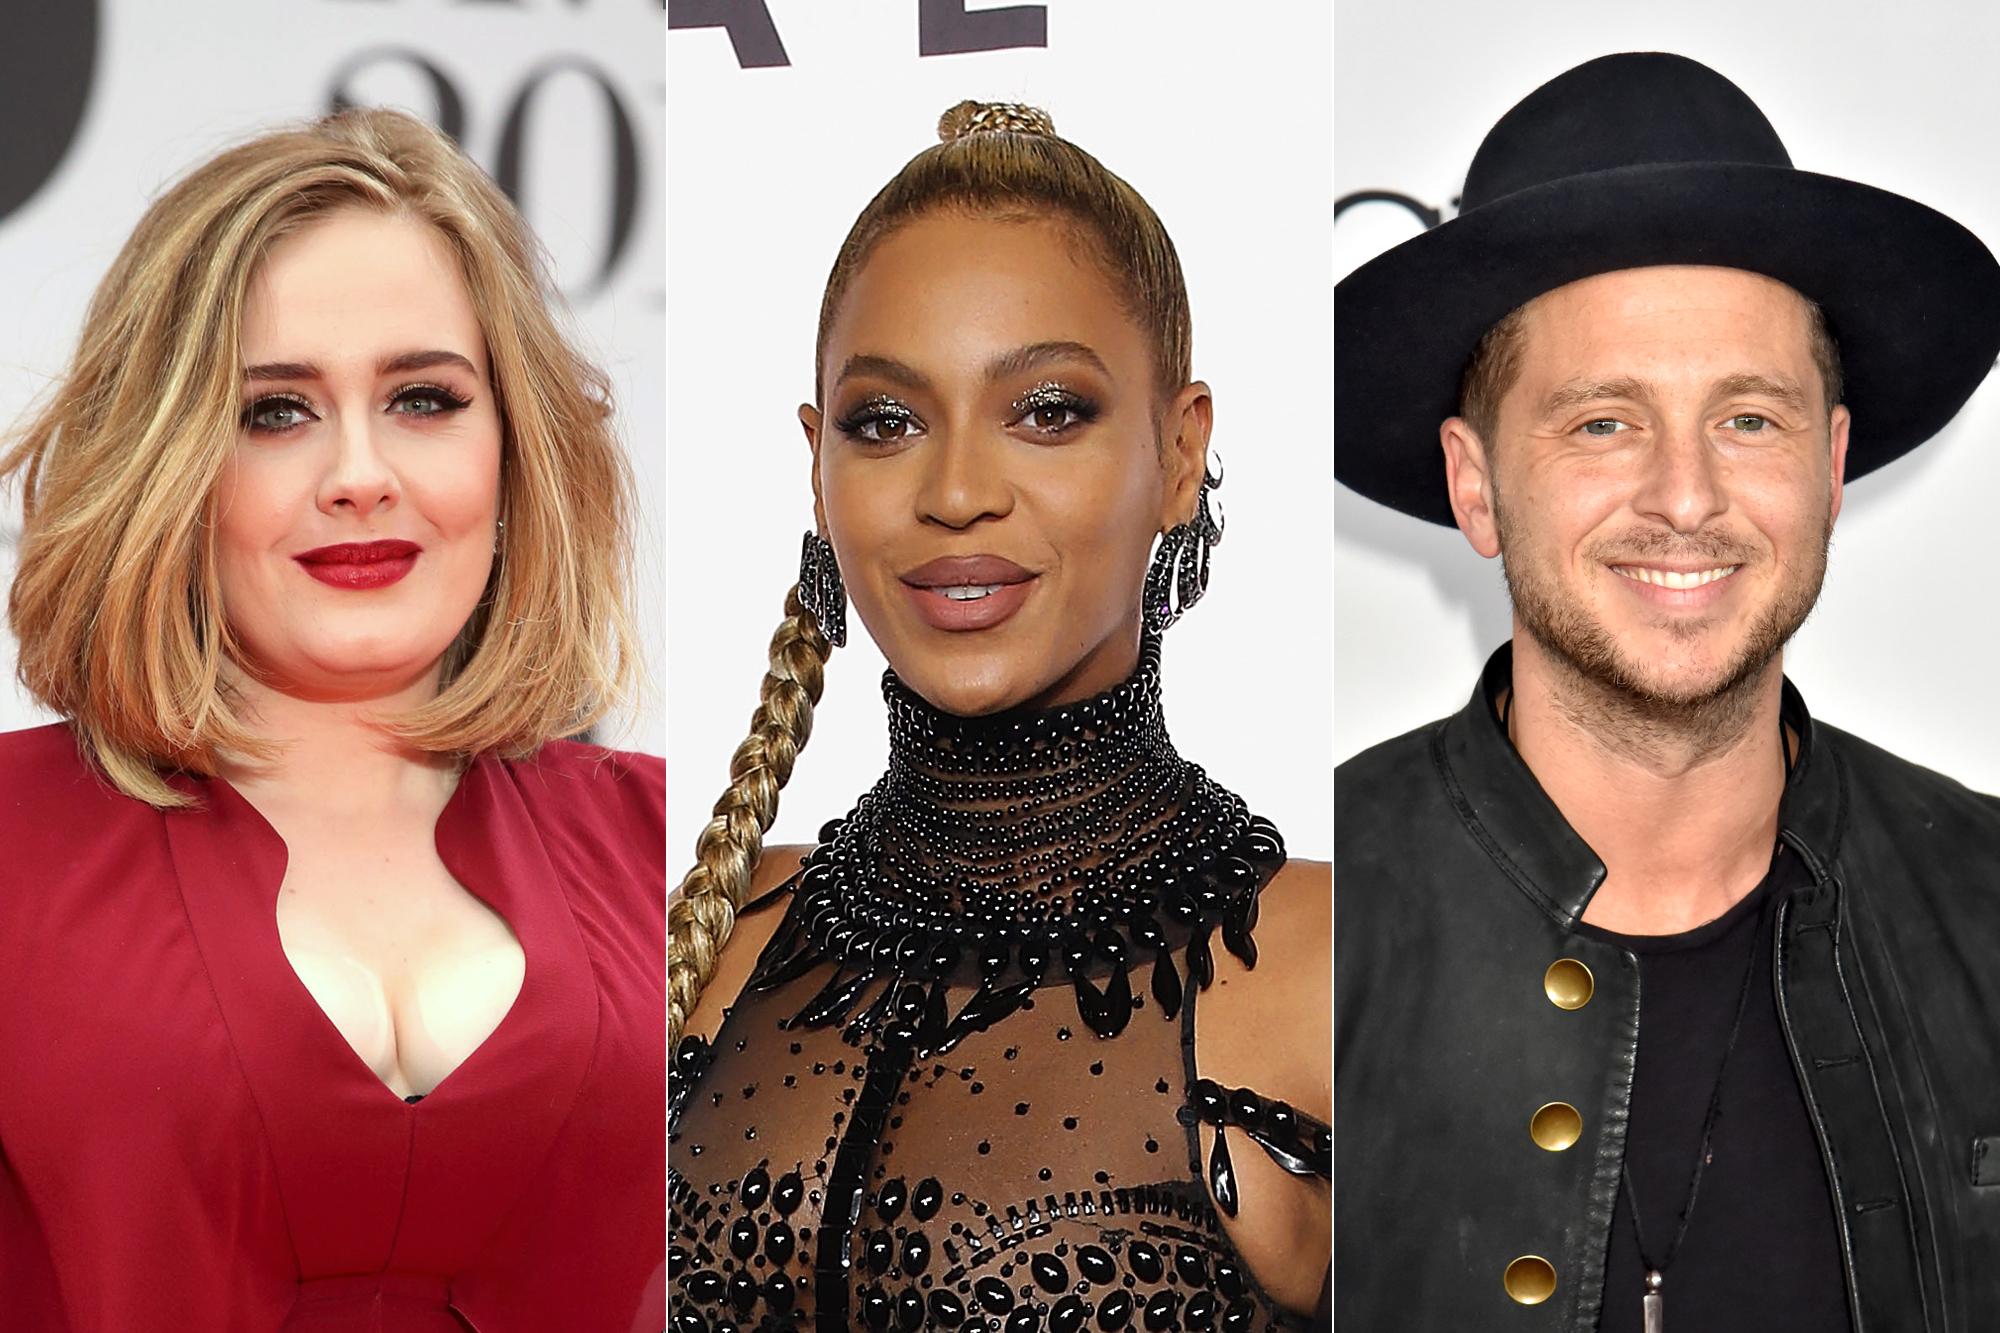 Adele; Beyonce, Ryan Tedder of OneRepublic